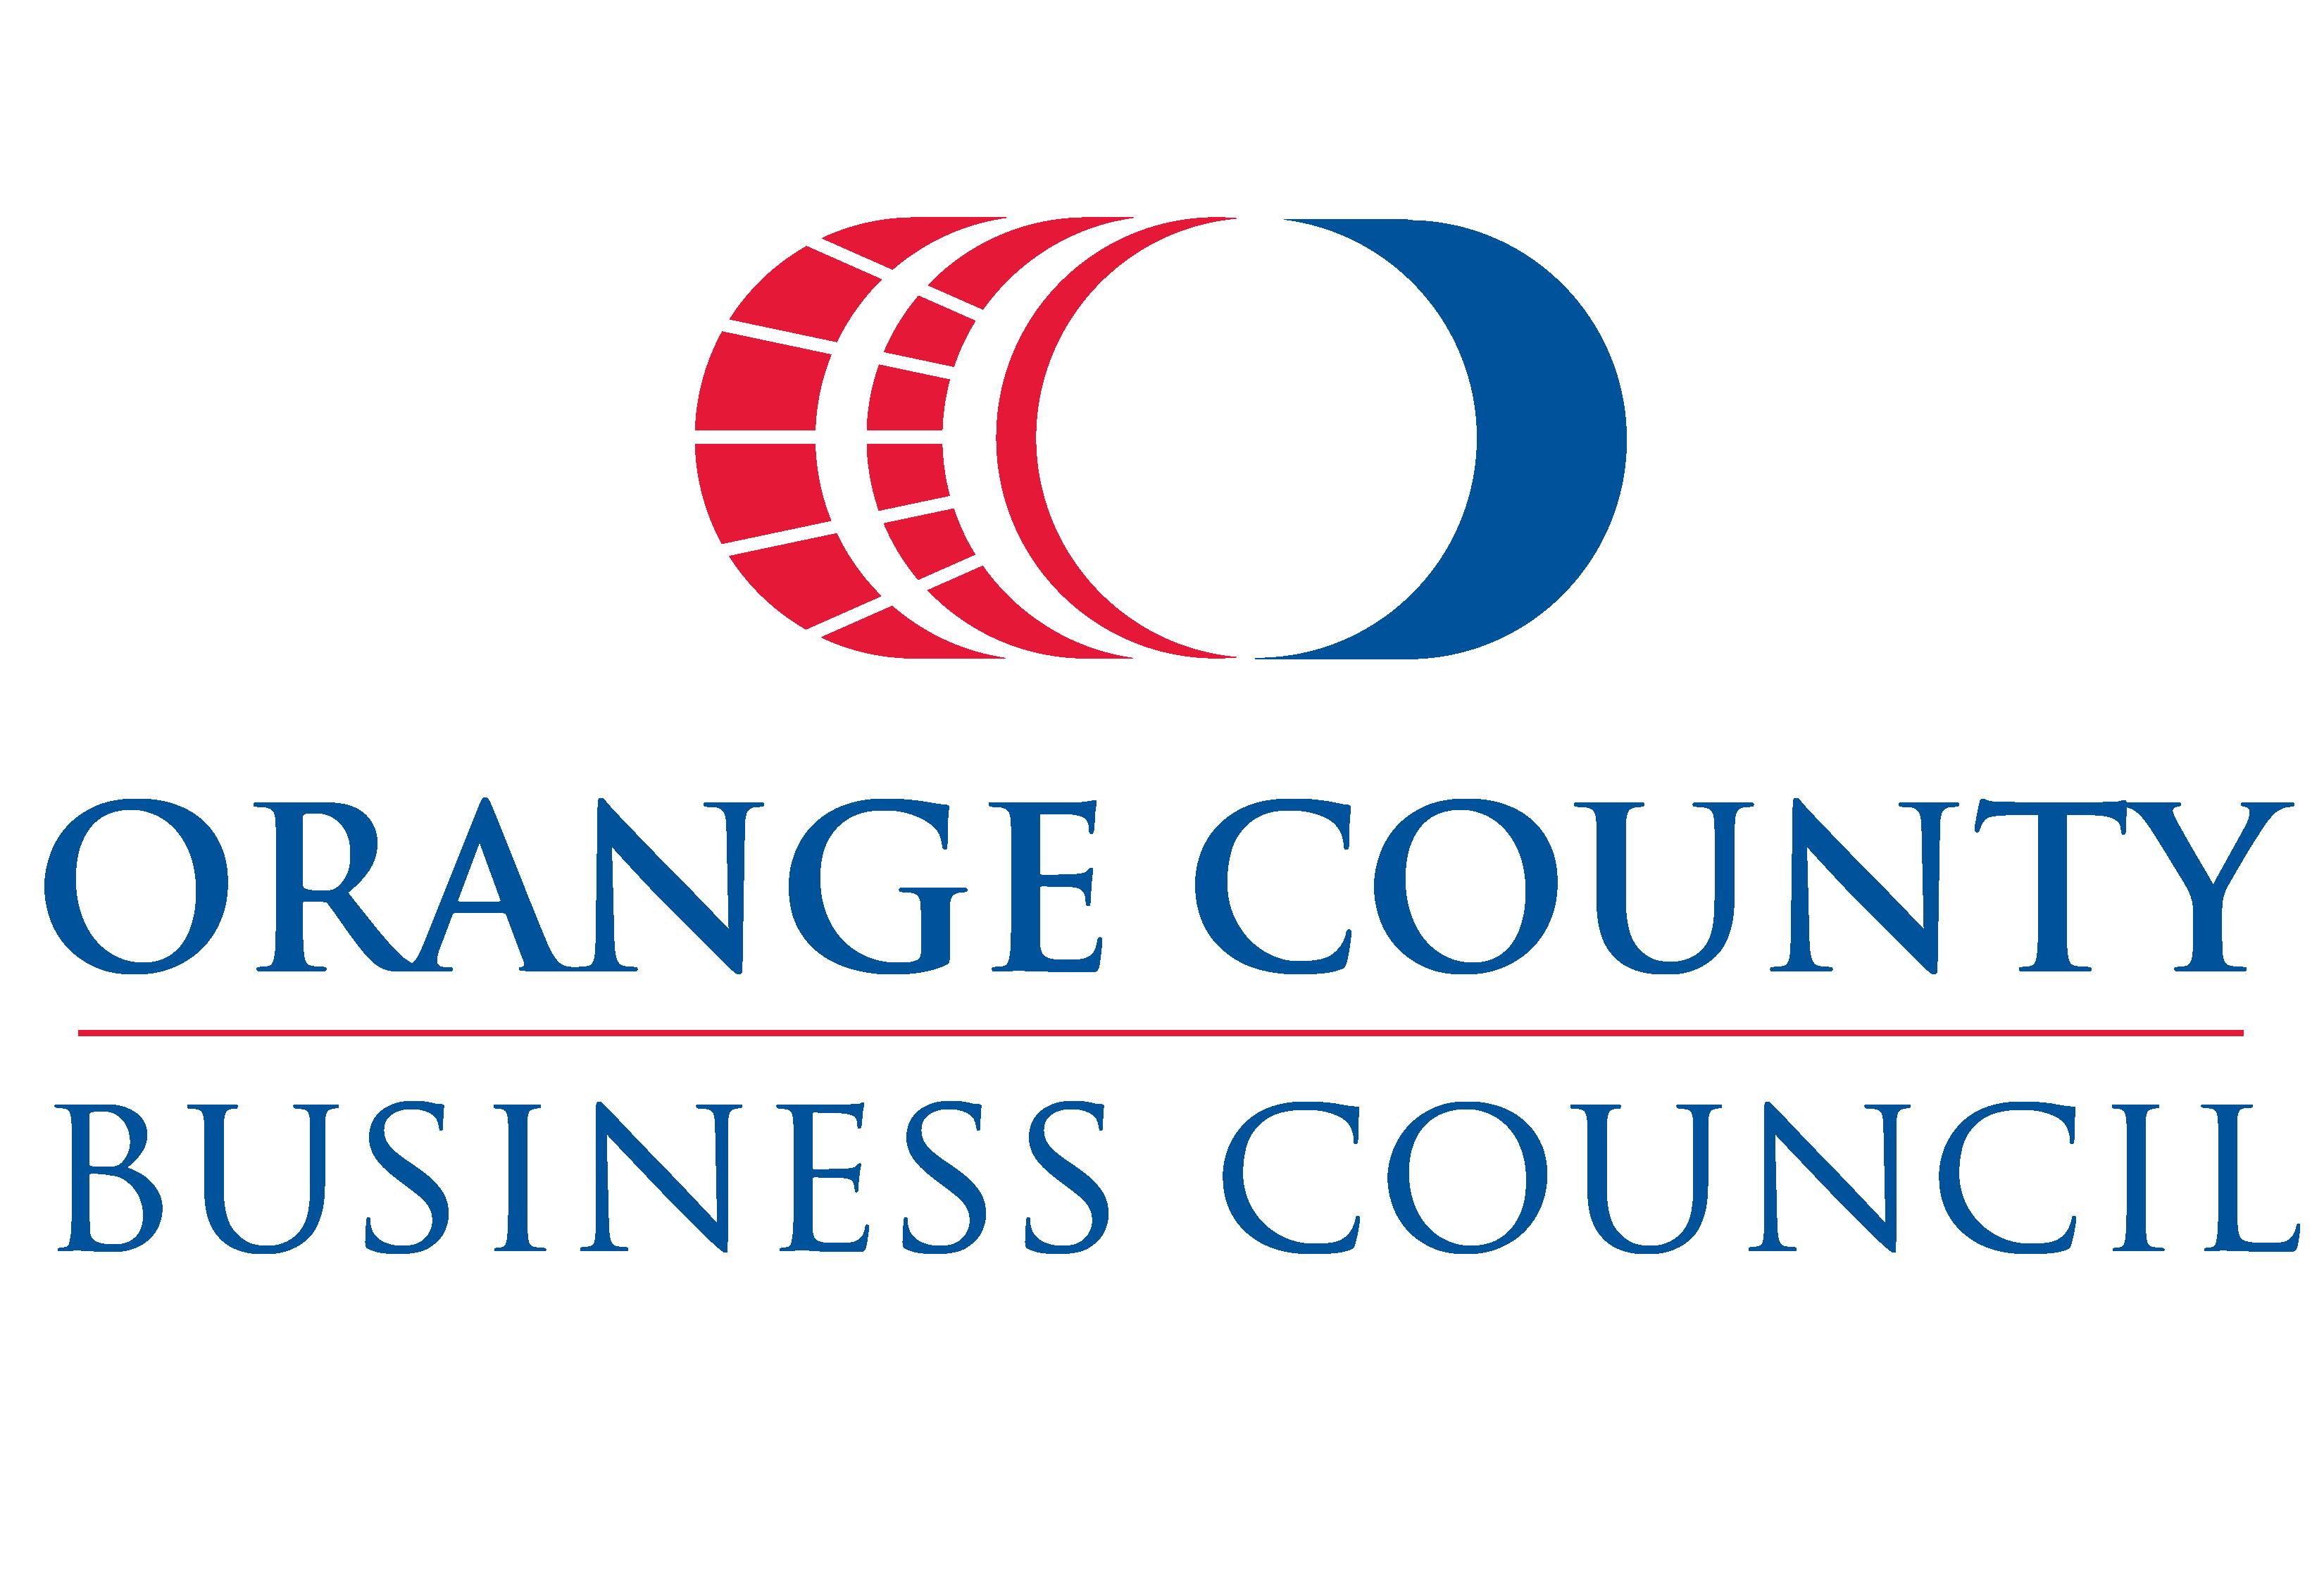 Orange County Business Council Logo